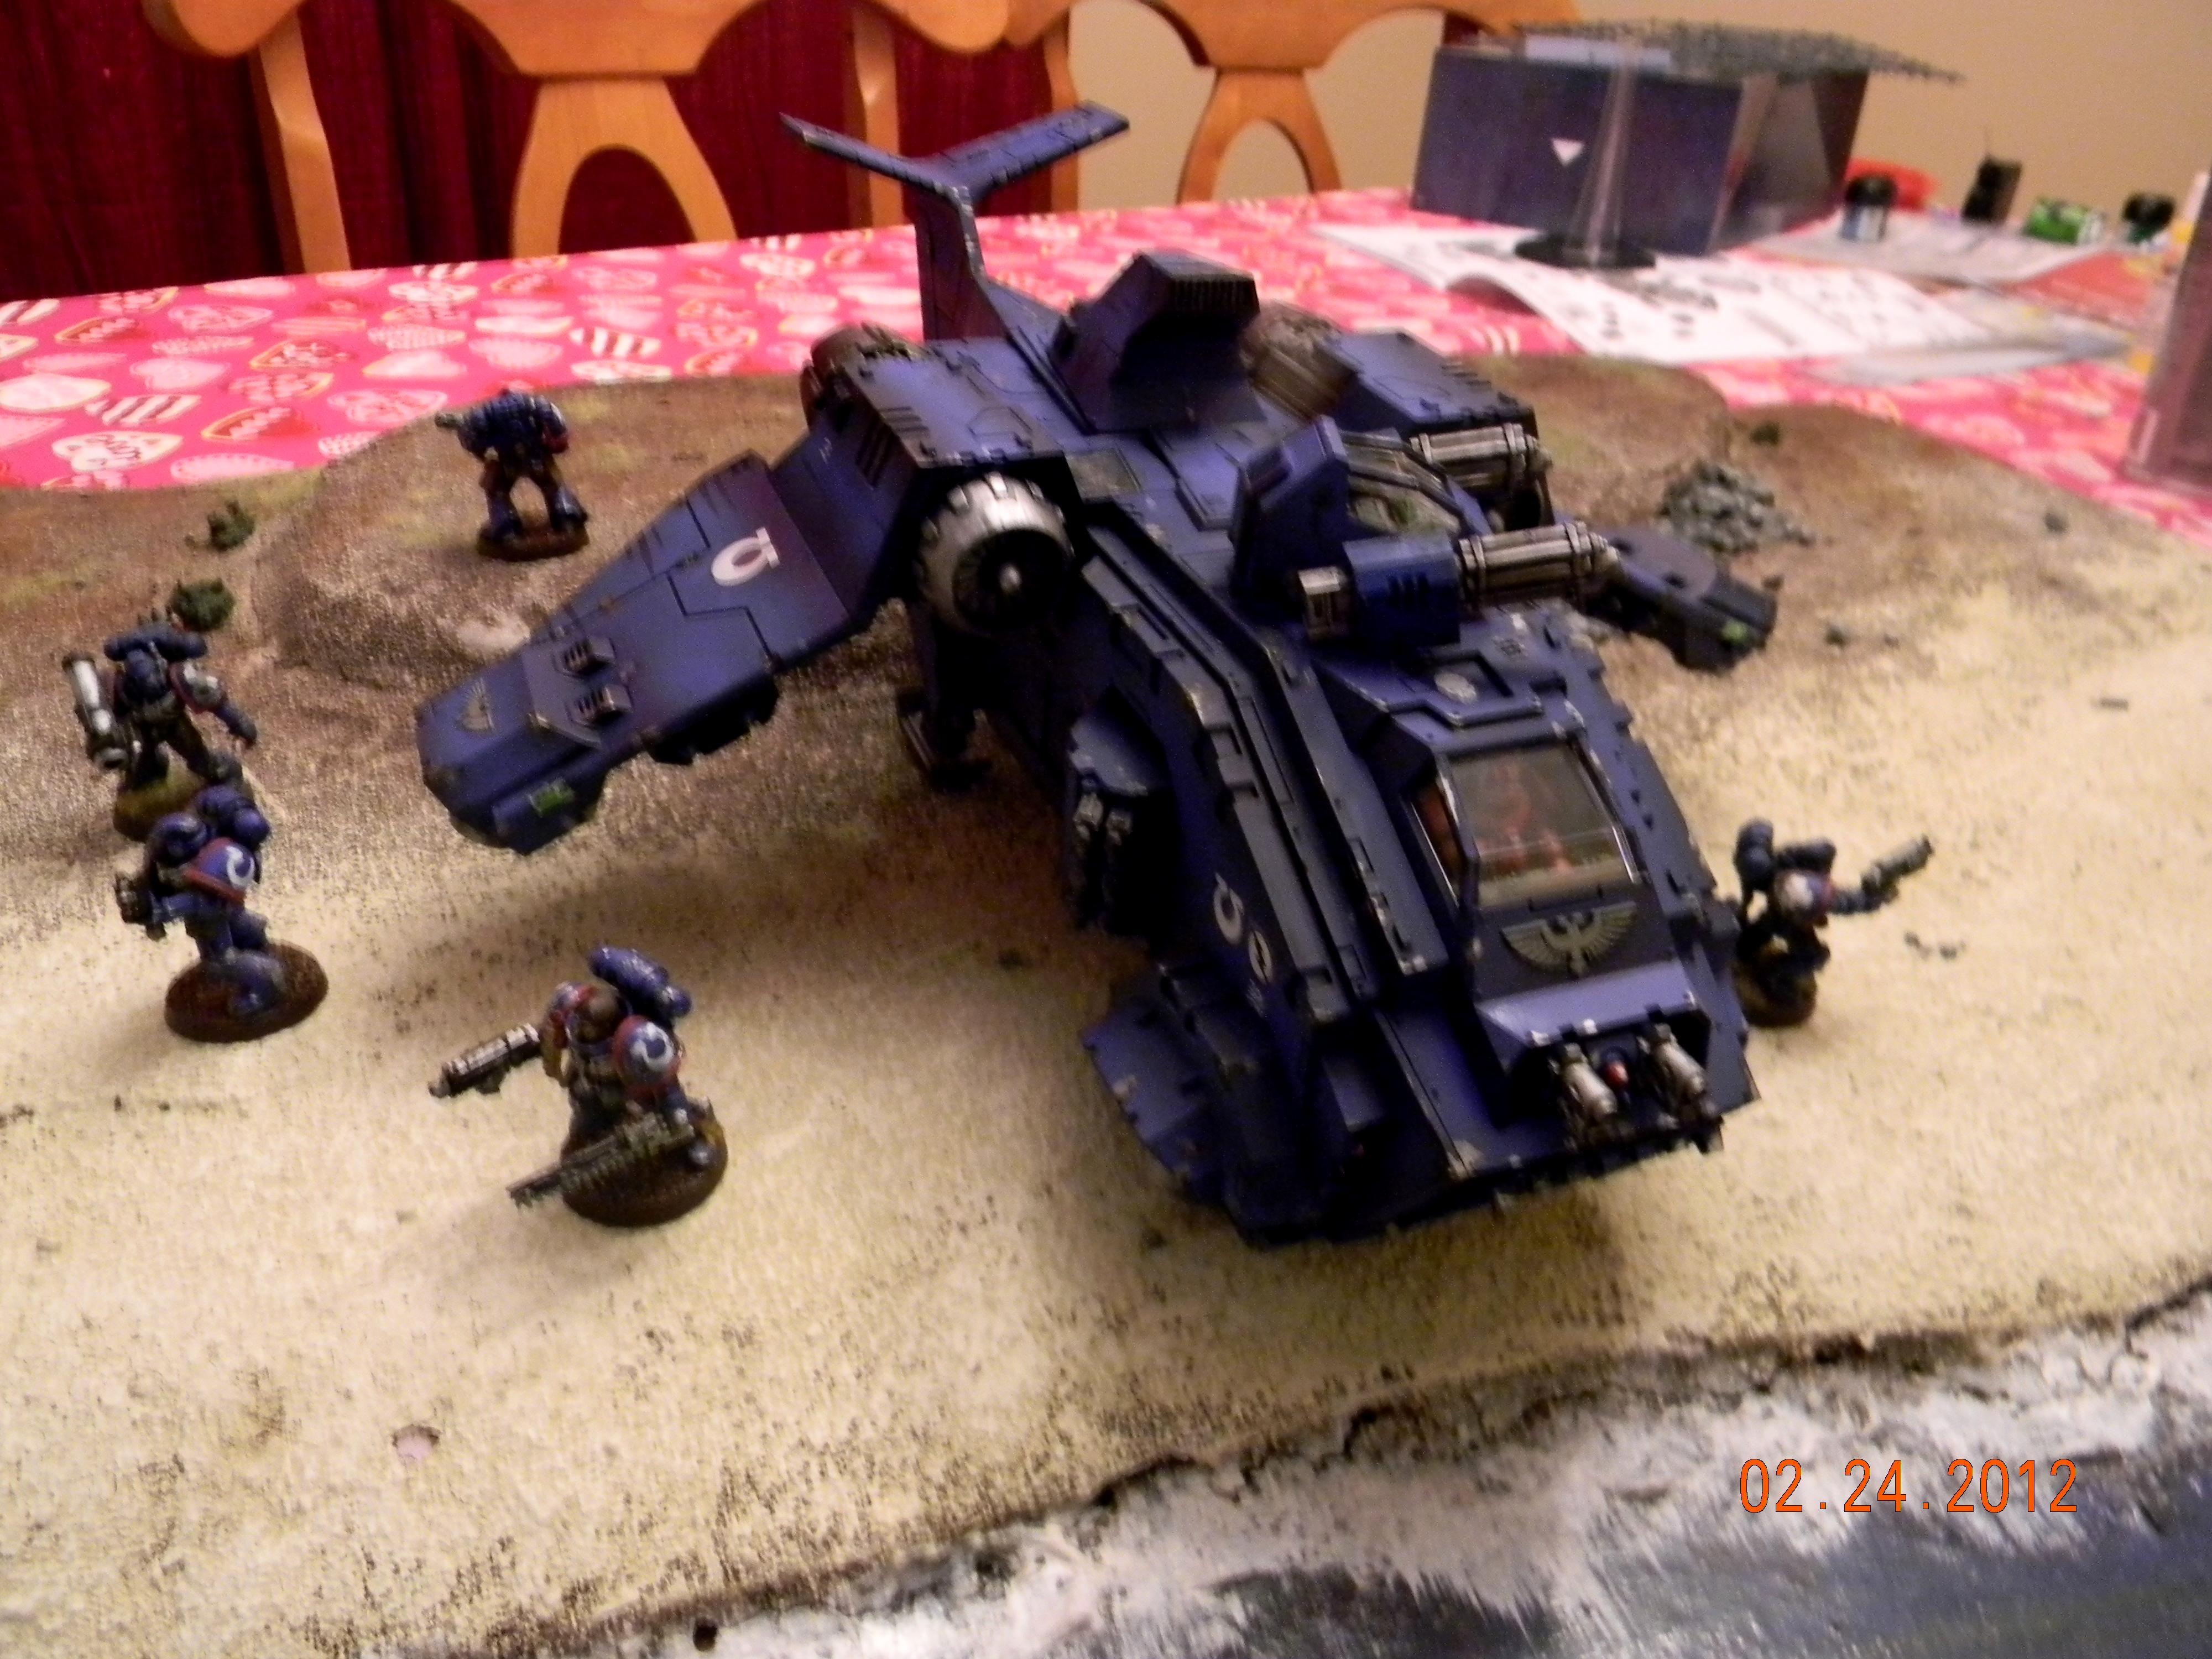 Flyer, Gunship, Space Marines, Stormraven, Ultramarines, Warhammer 40,000